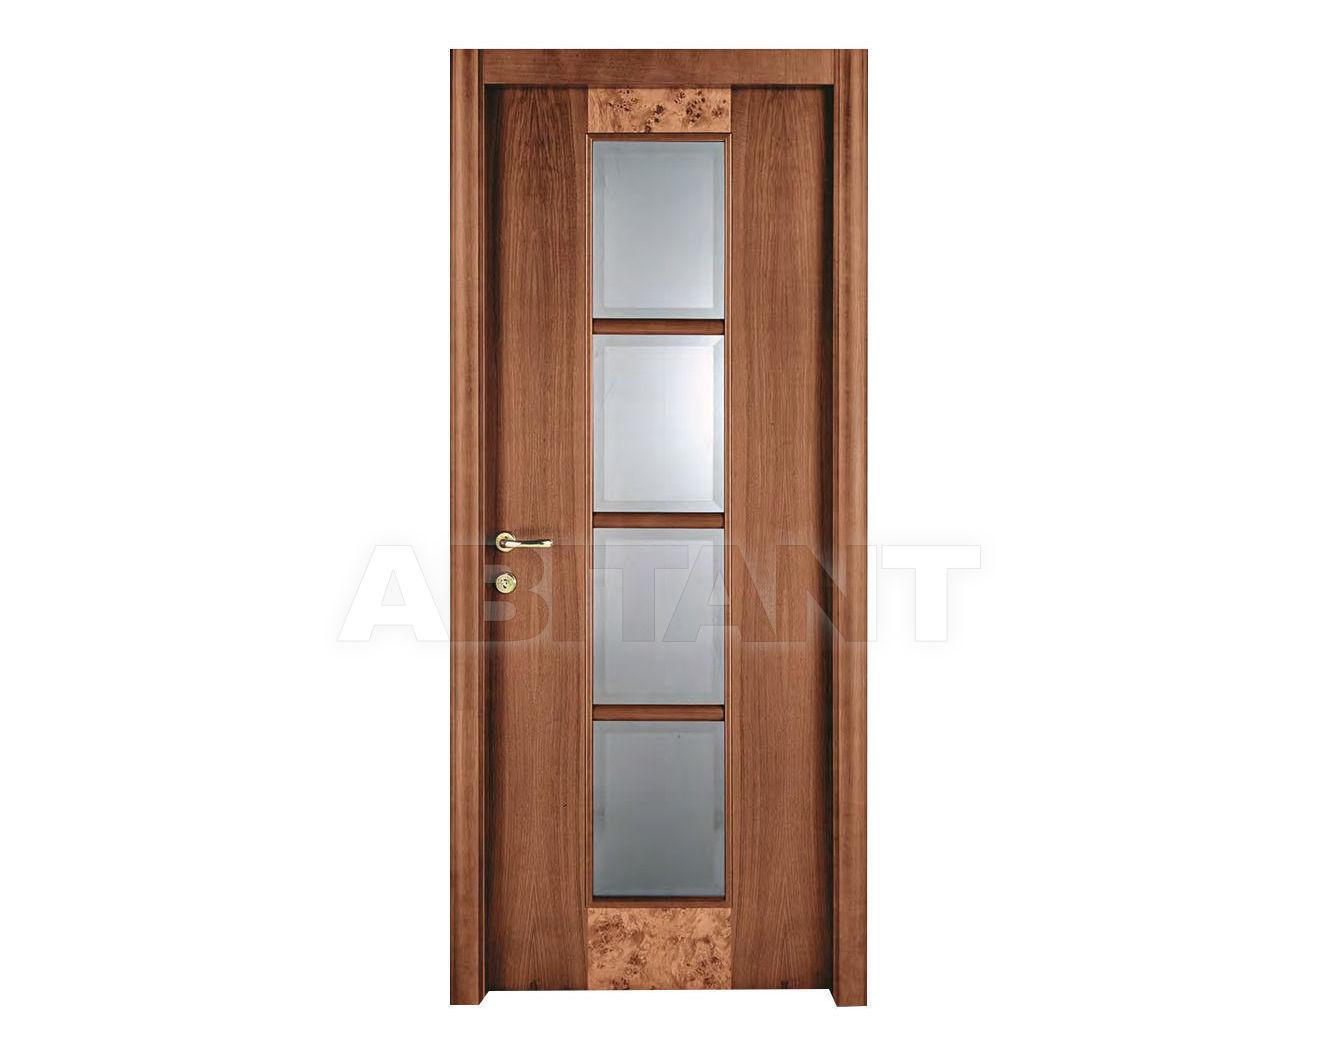 Купить Дверь деревянная Fioravazzi Classiche ARIANNA 5 MANTOVANA